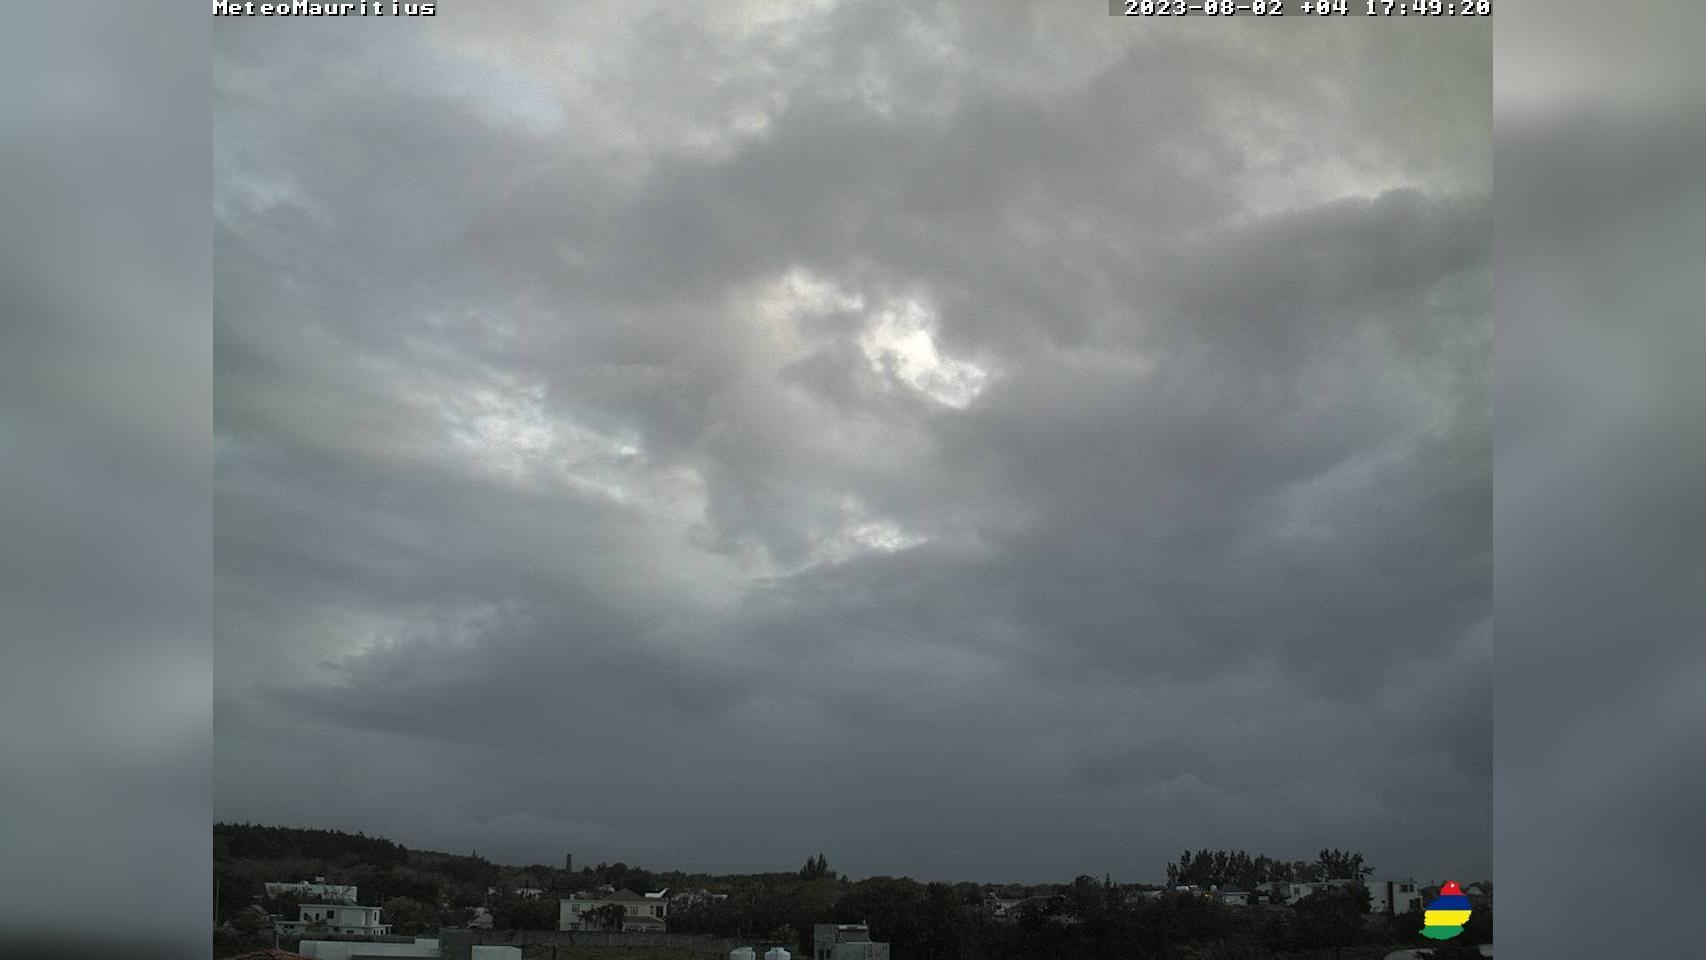 Webcam Mon Loisir: meteomauritius